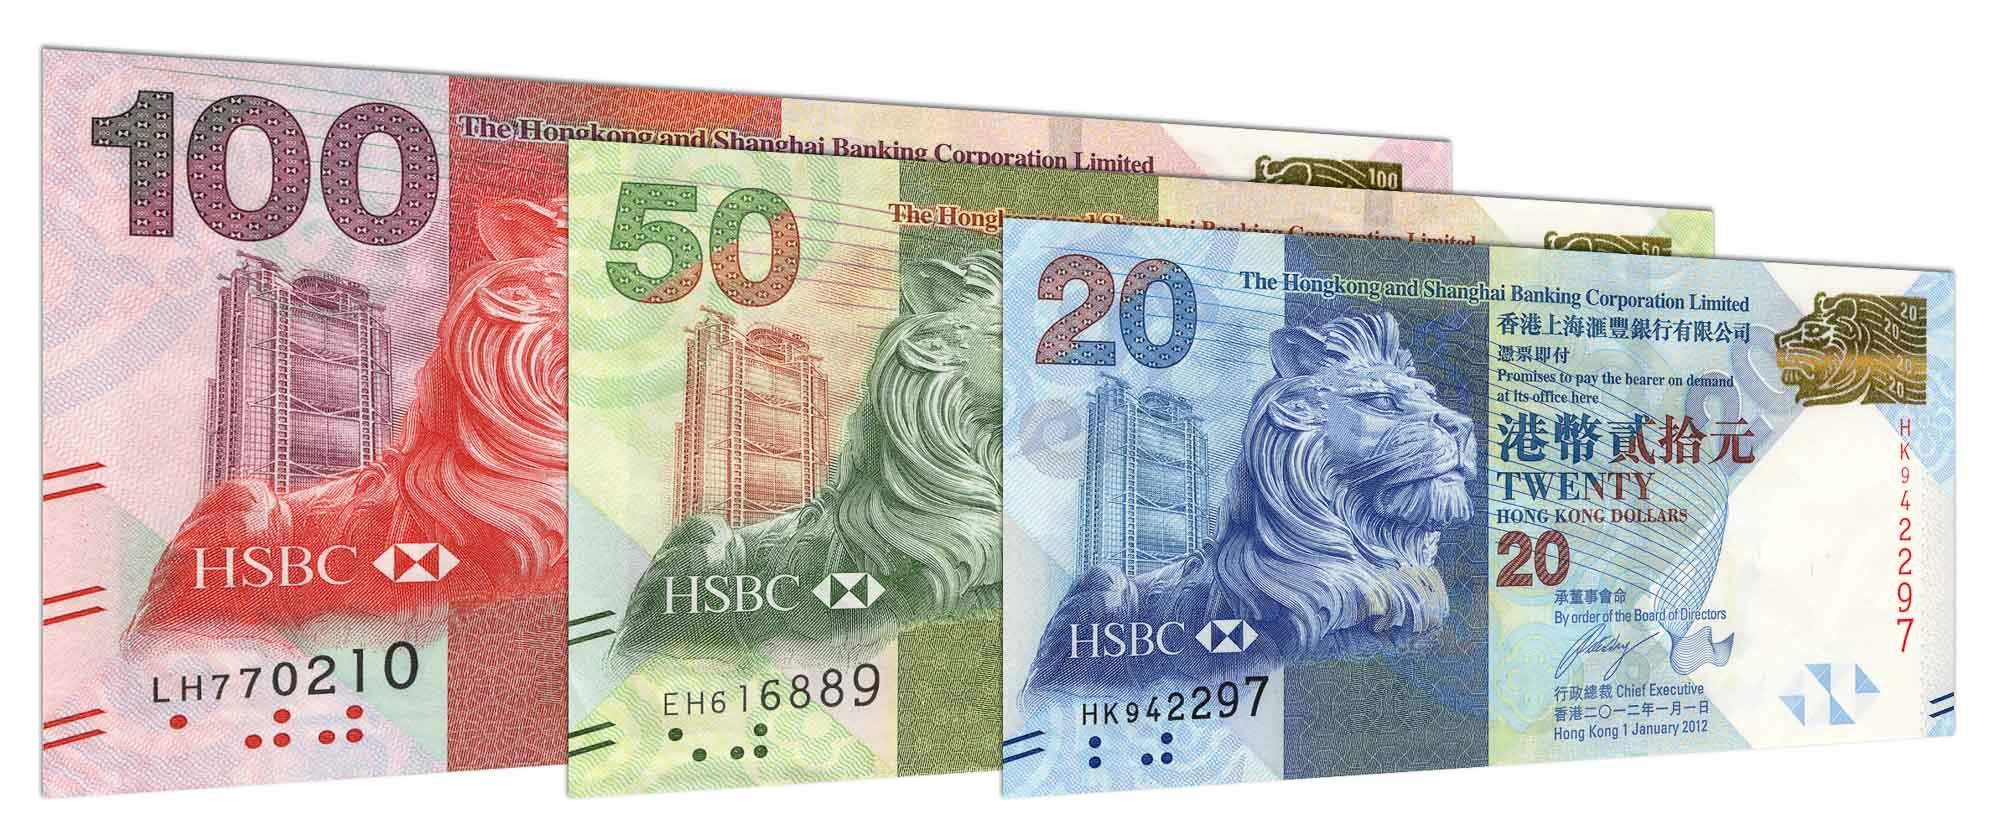 Hong Kong Dollars Online Hkd Home